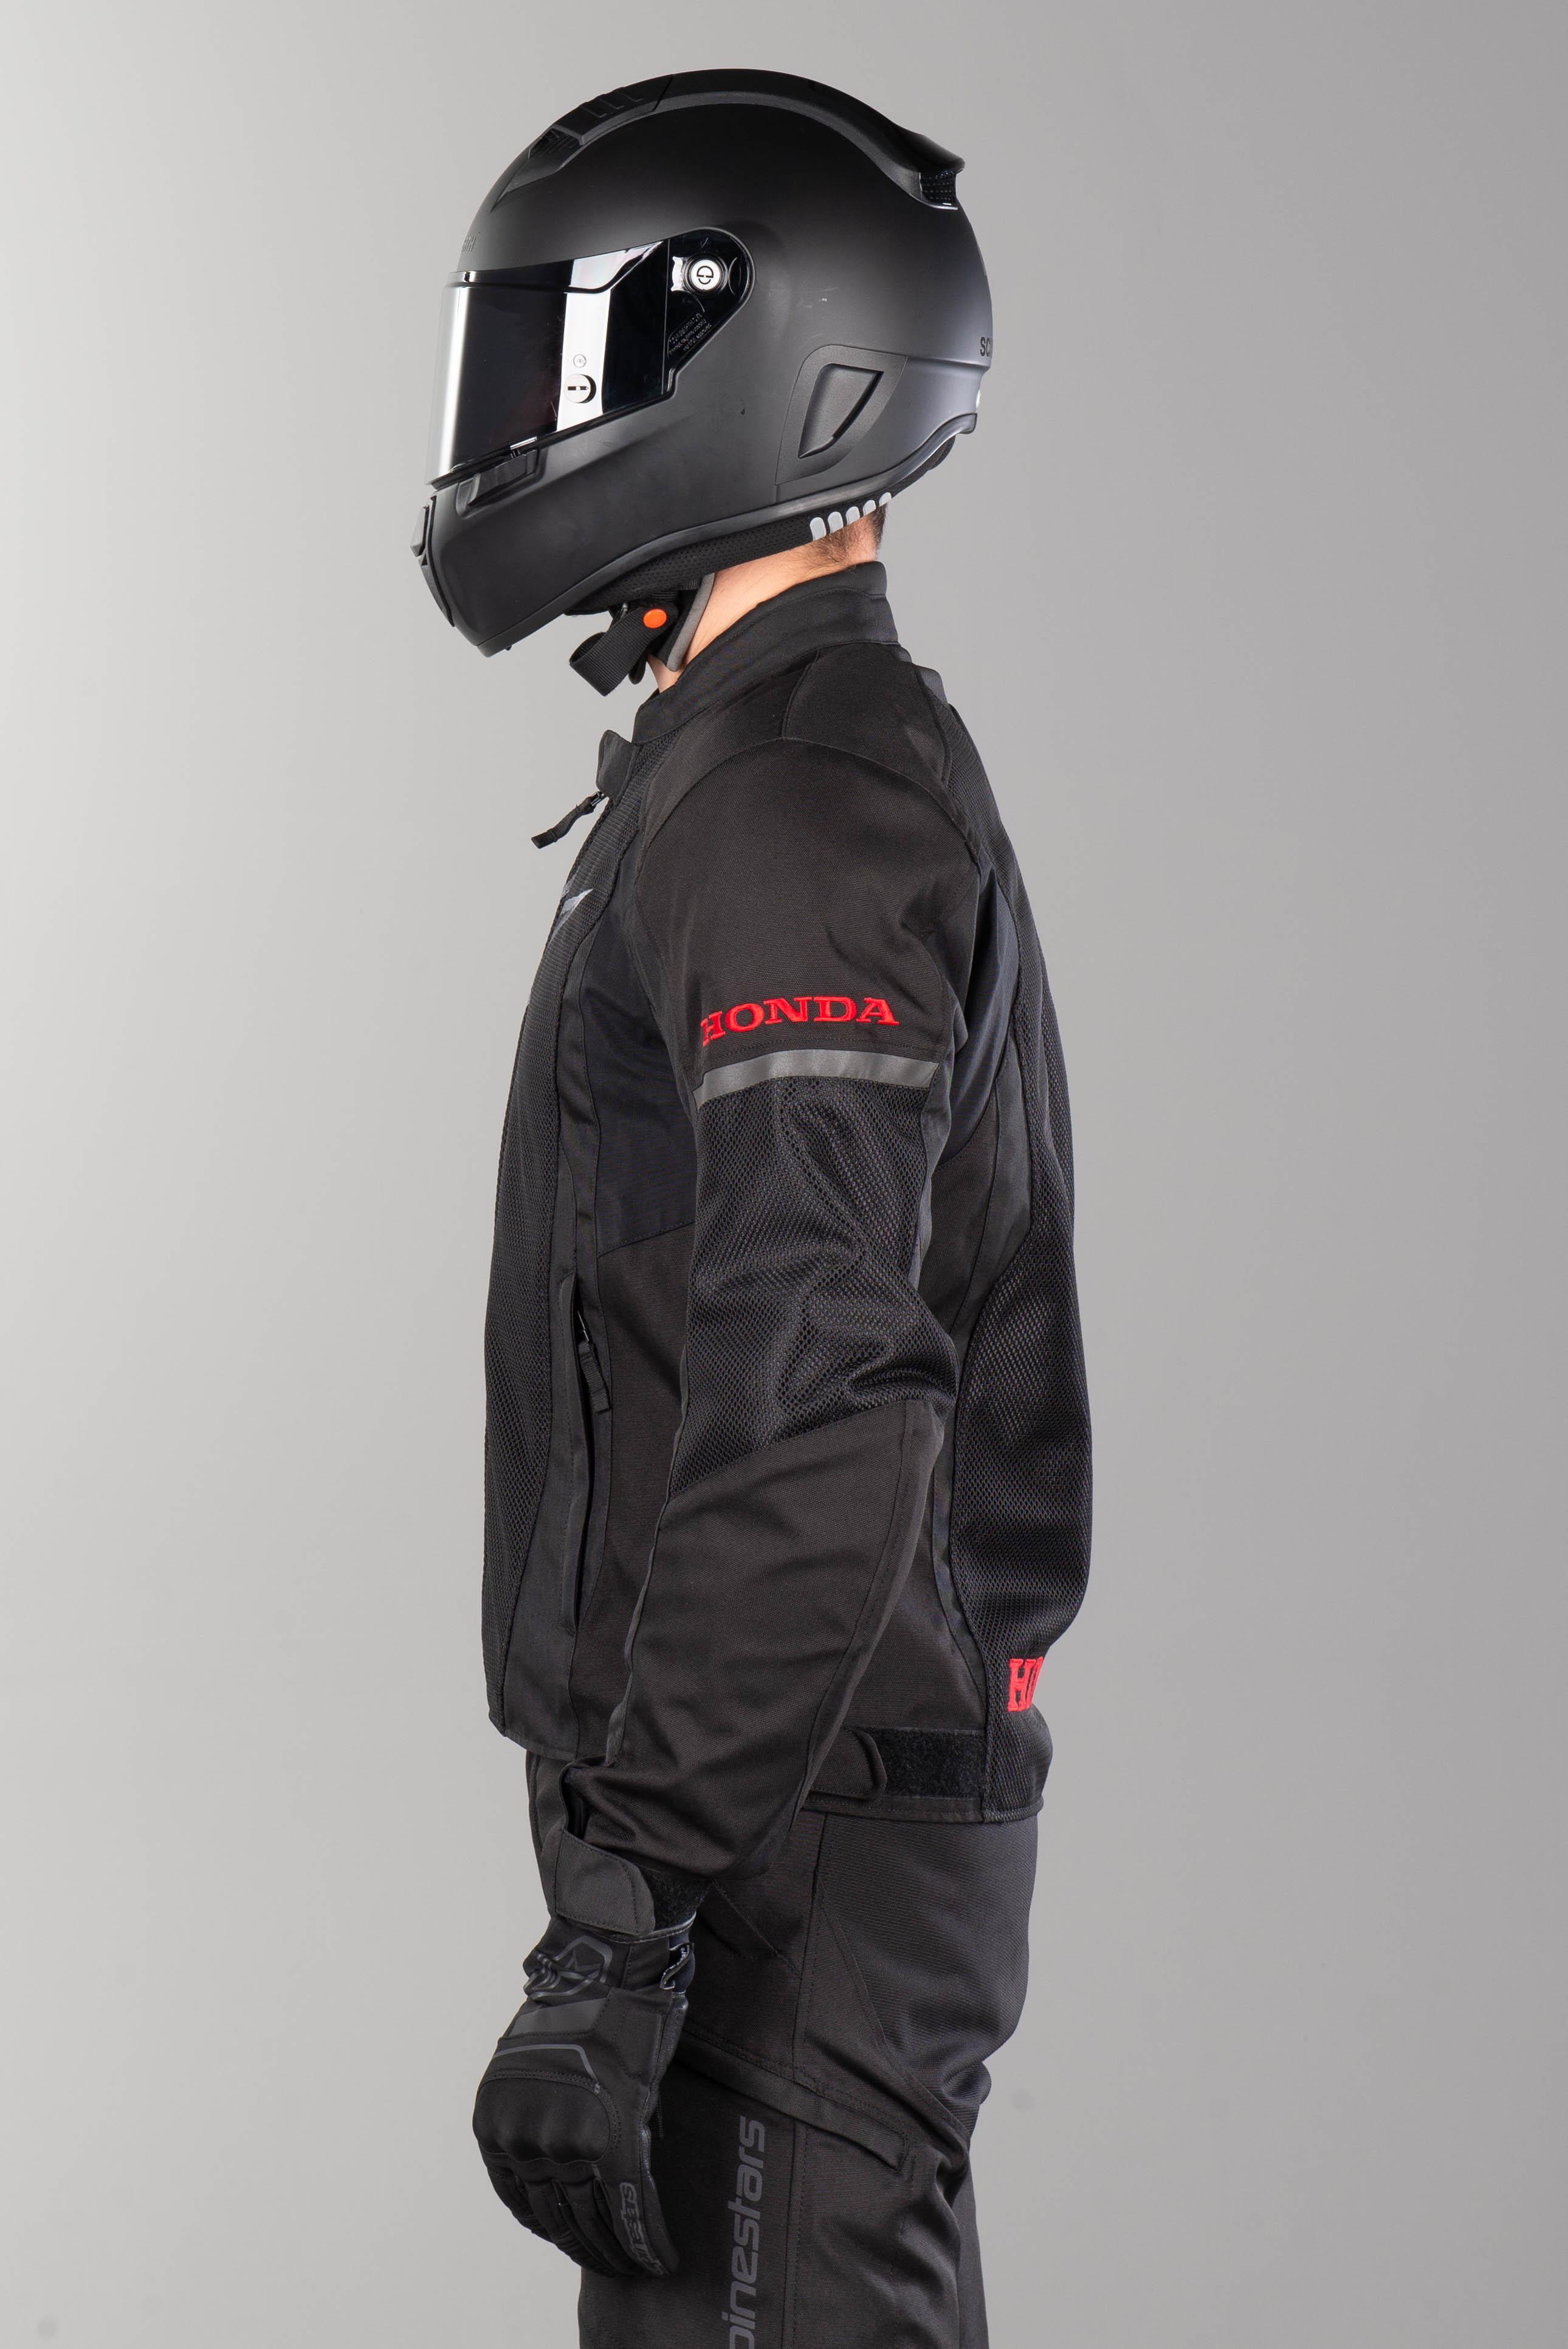 MC Jakke Alpinestars Honda T Faster Air Svart Nå 5% Du